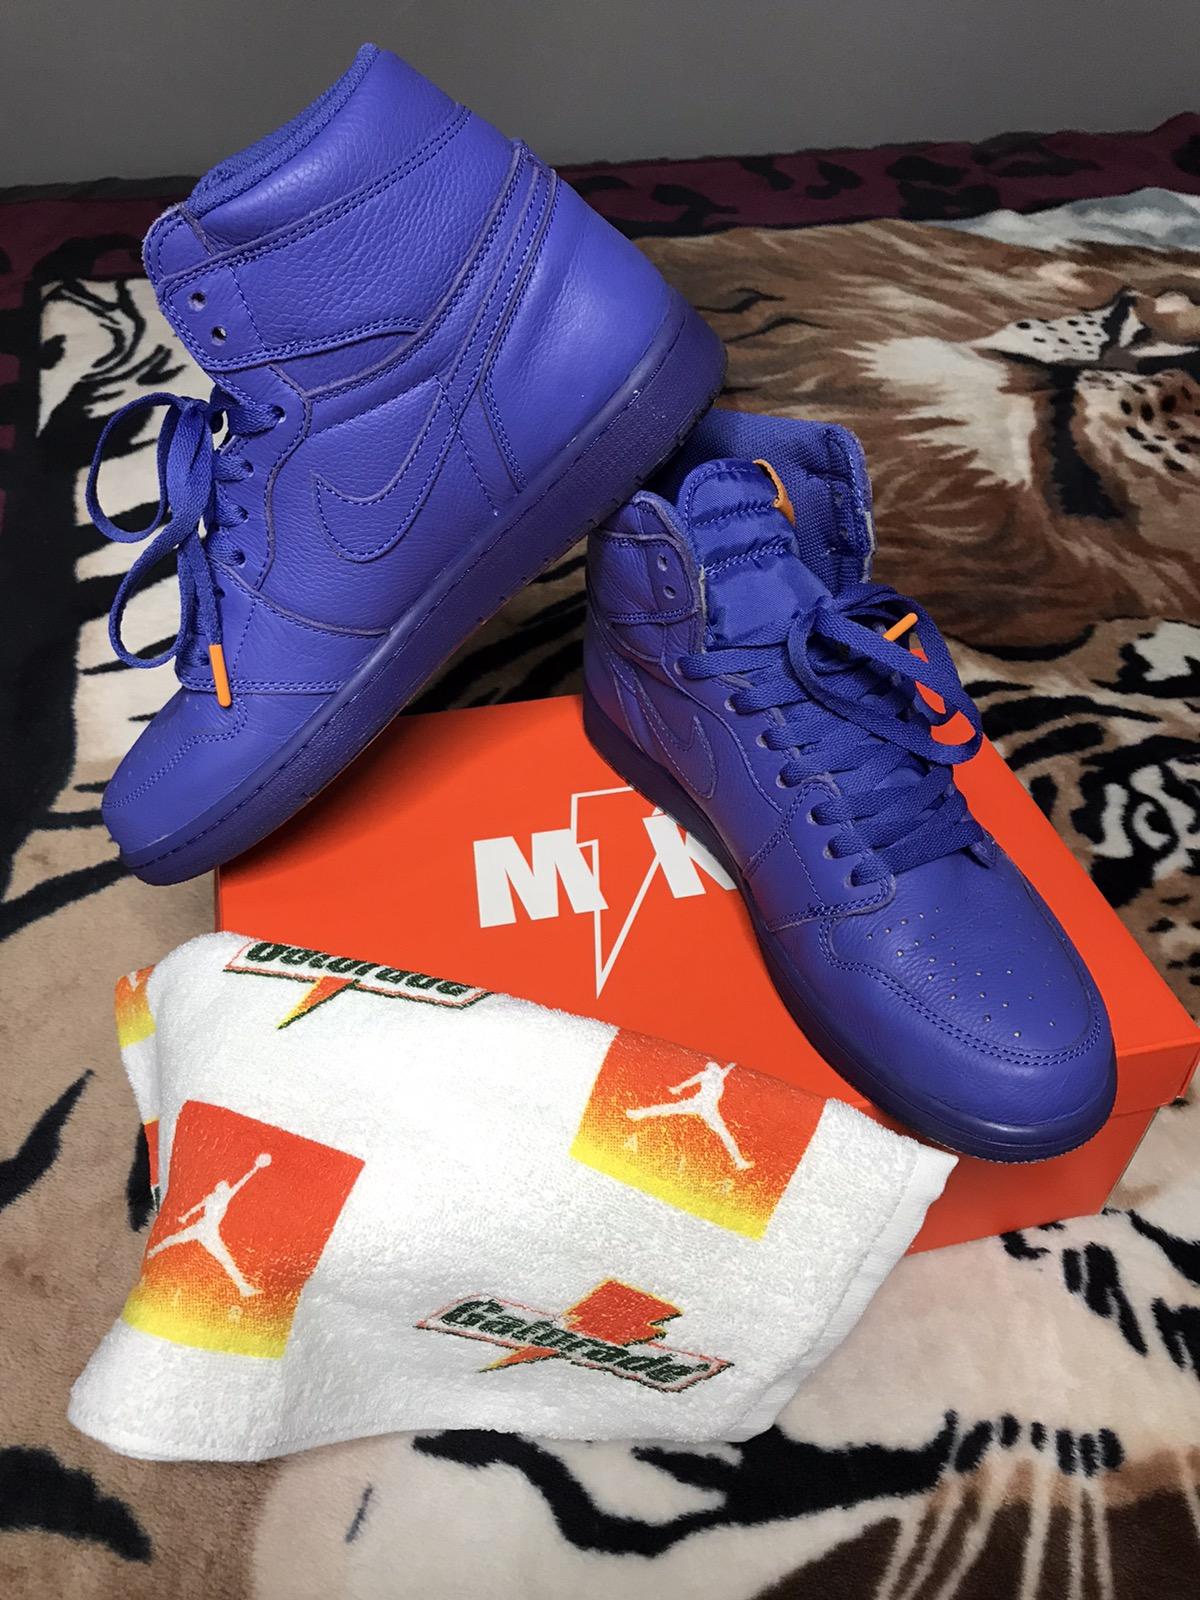 Nike Air Jordan 1 Retro High OG G8RD Rush Violet Gatorade Pack